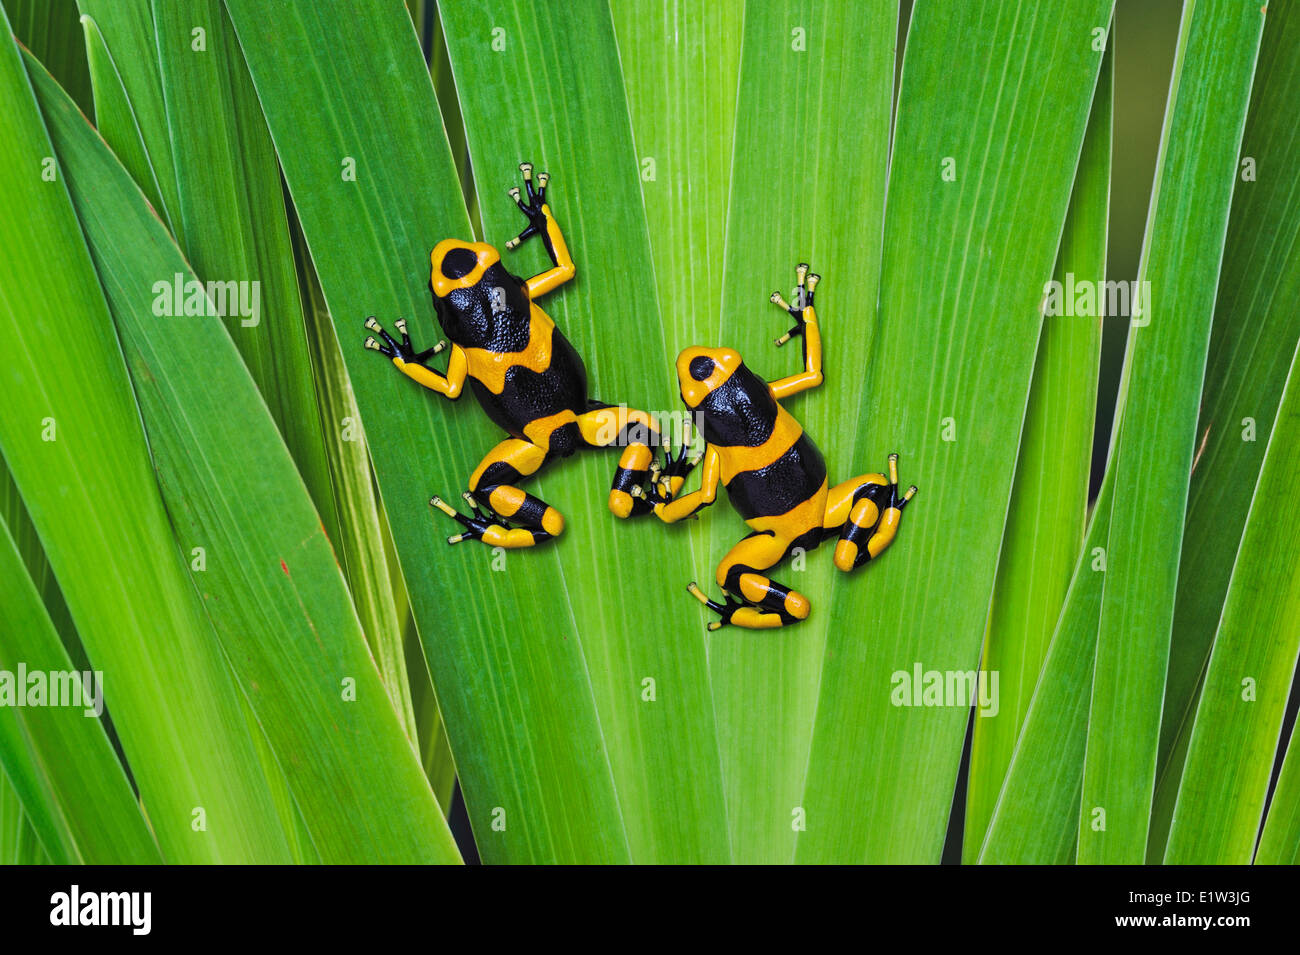 Bumblebee poison dart frog/Guyana Banded dart frog (Dendrobates leucomelas), native to Guyana, South America. - Stock Image